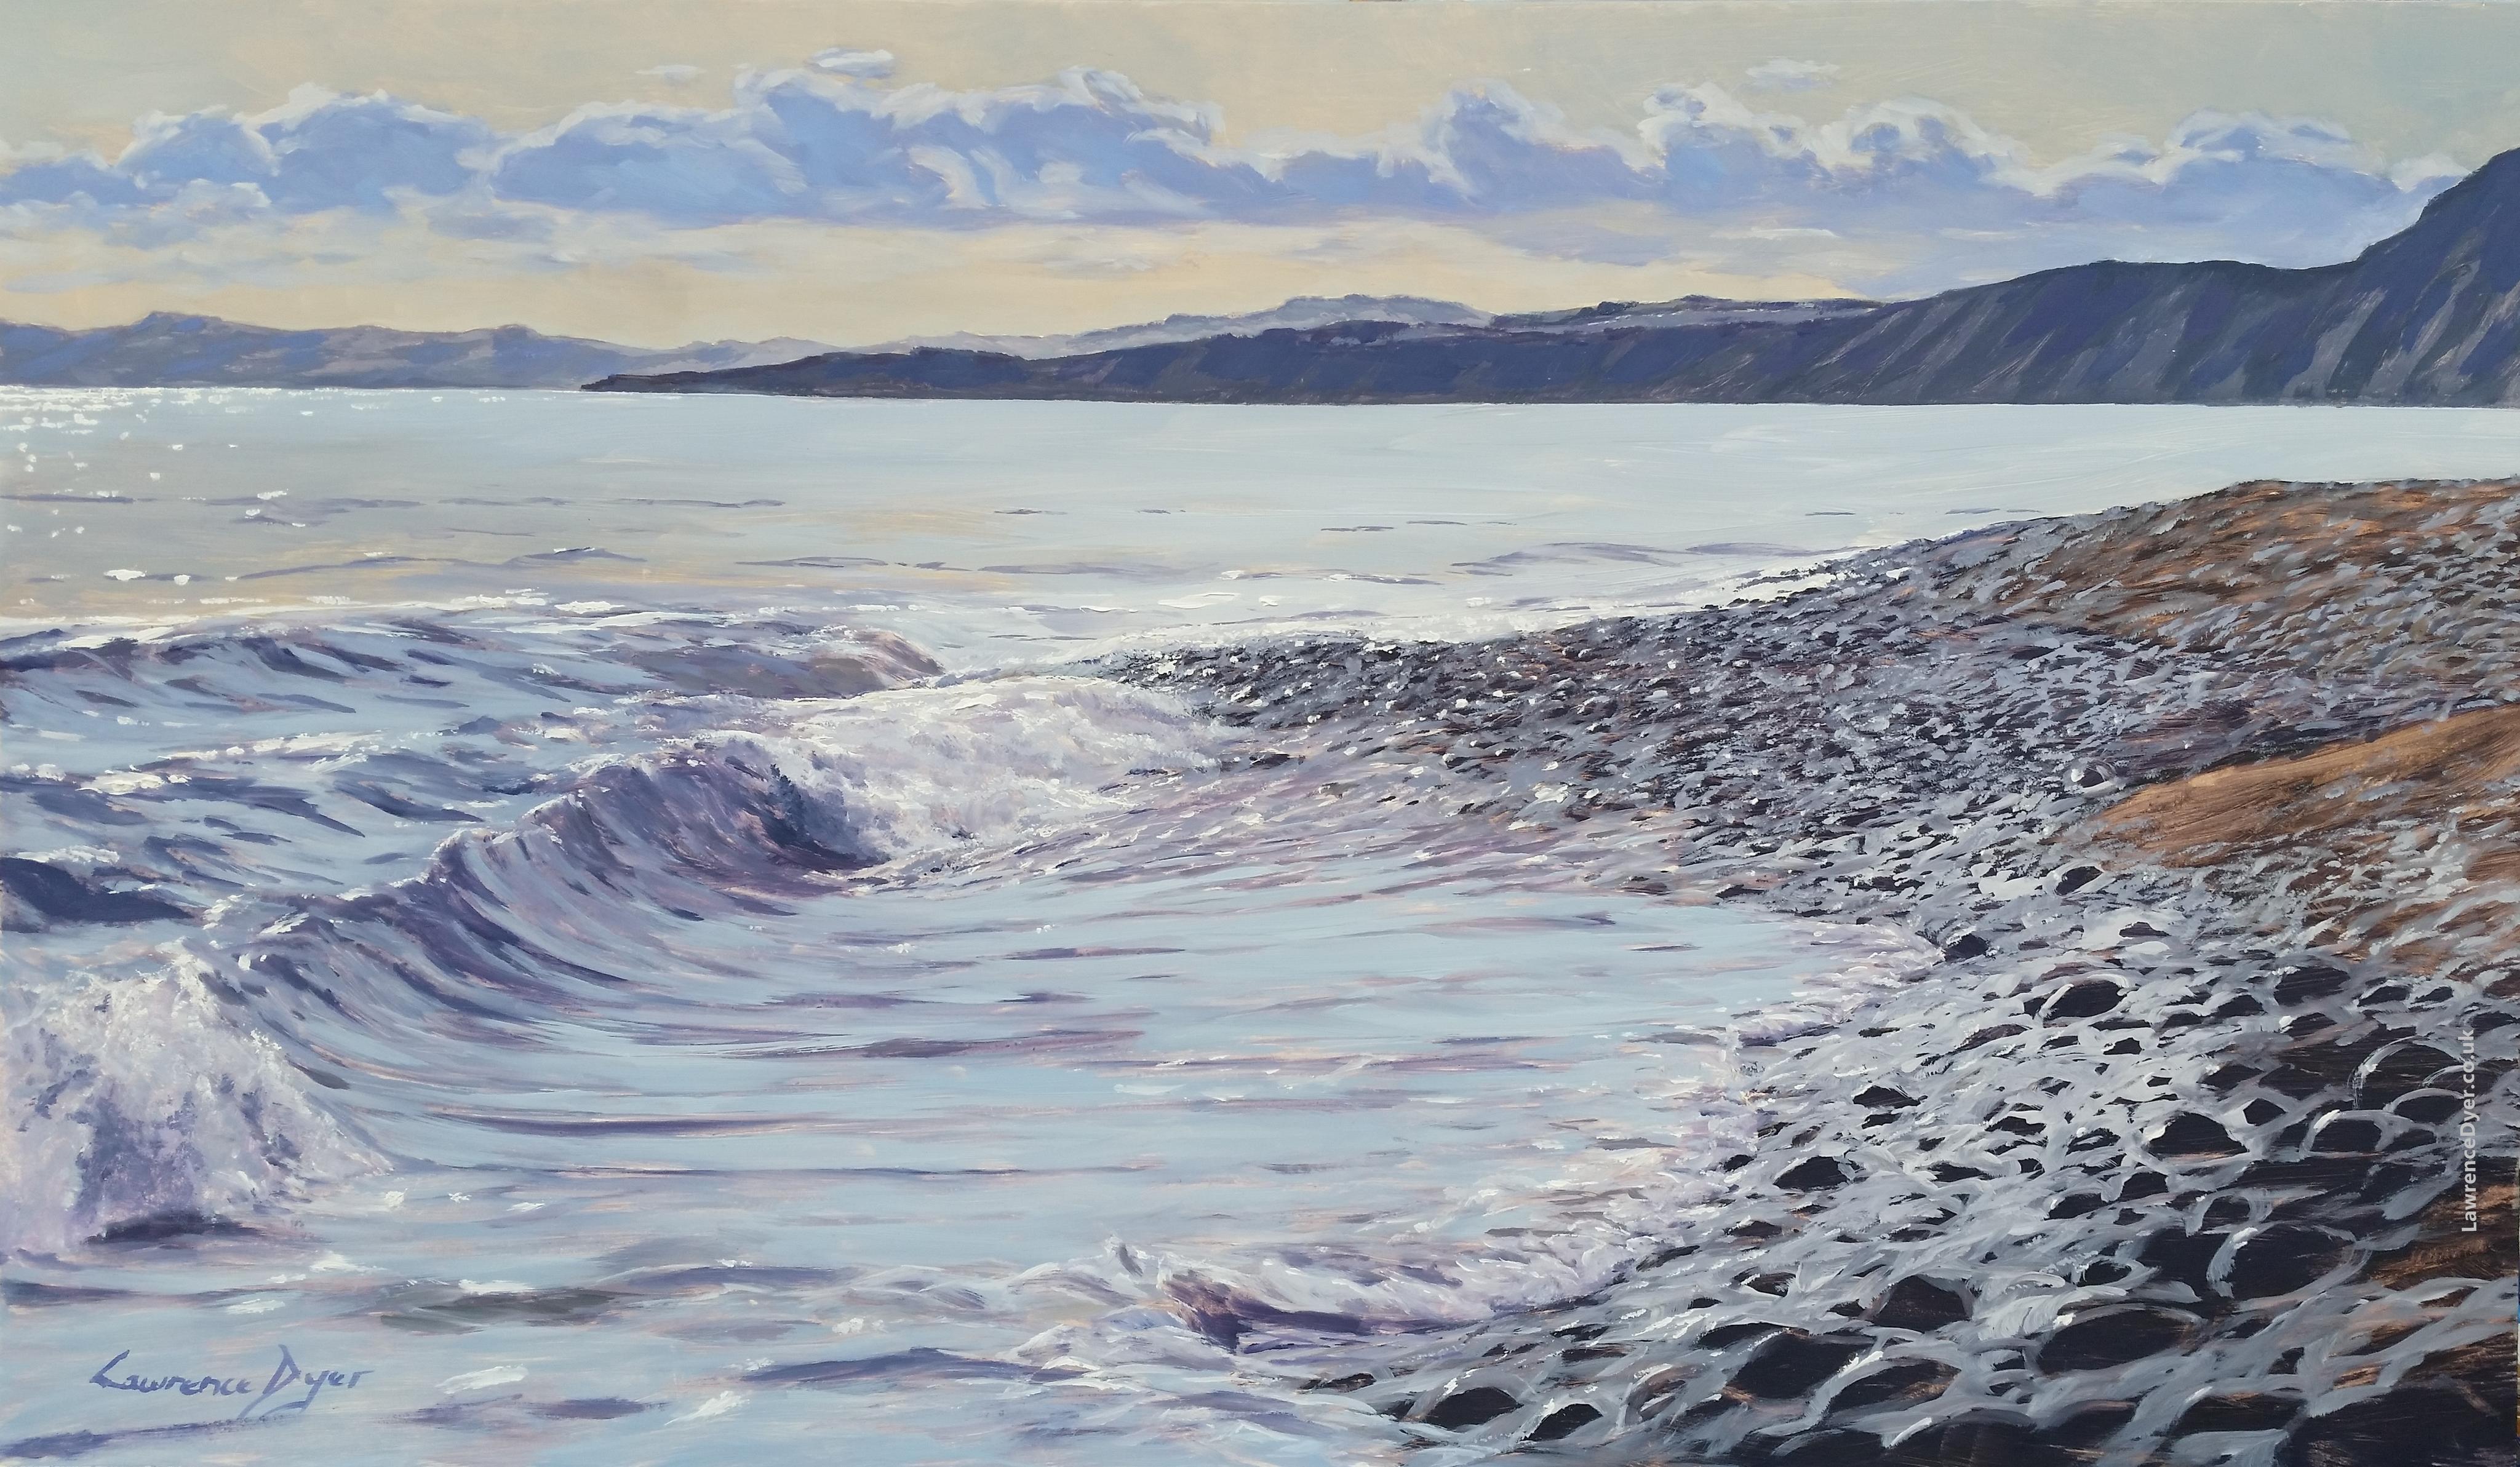 Budleigh Salterton waves